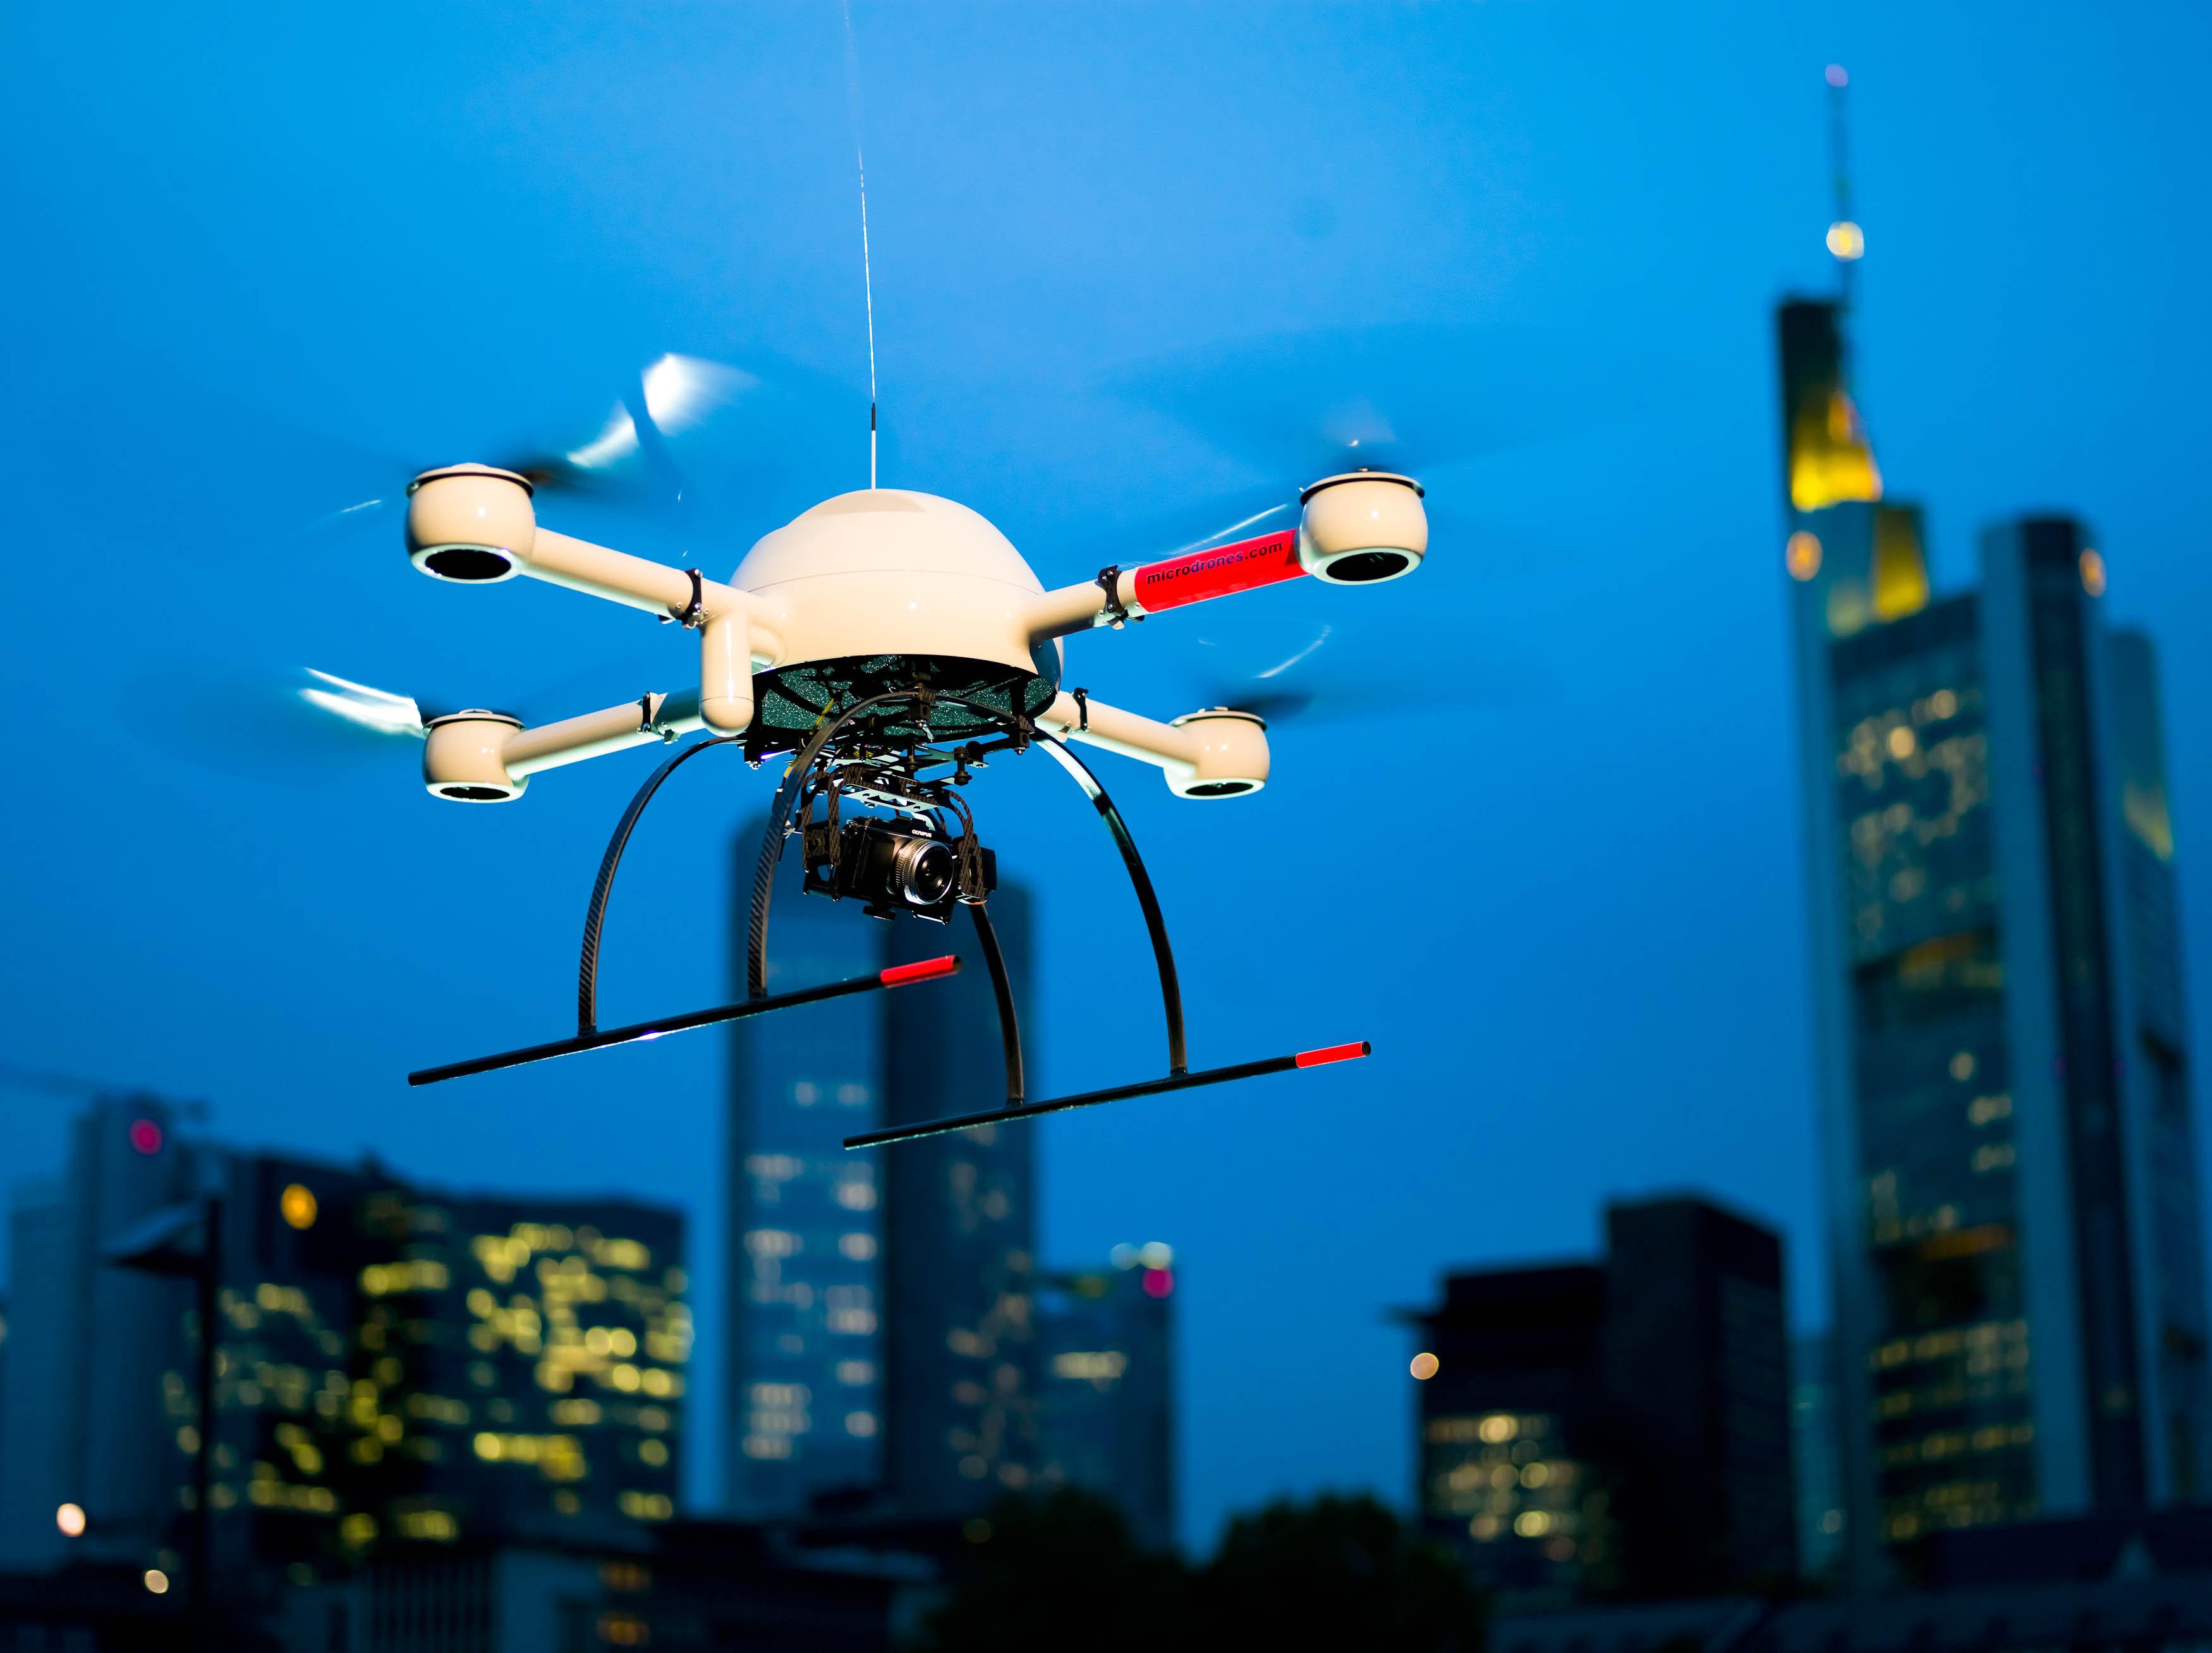 microdrones-md4-1000-press-kit-industry.jpg